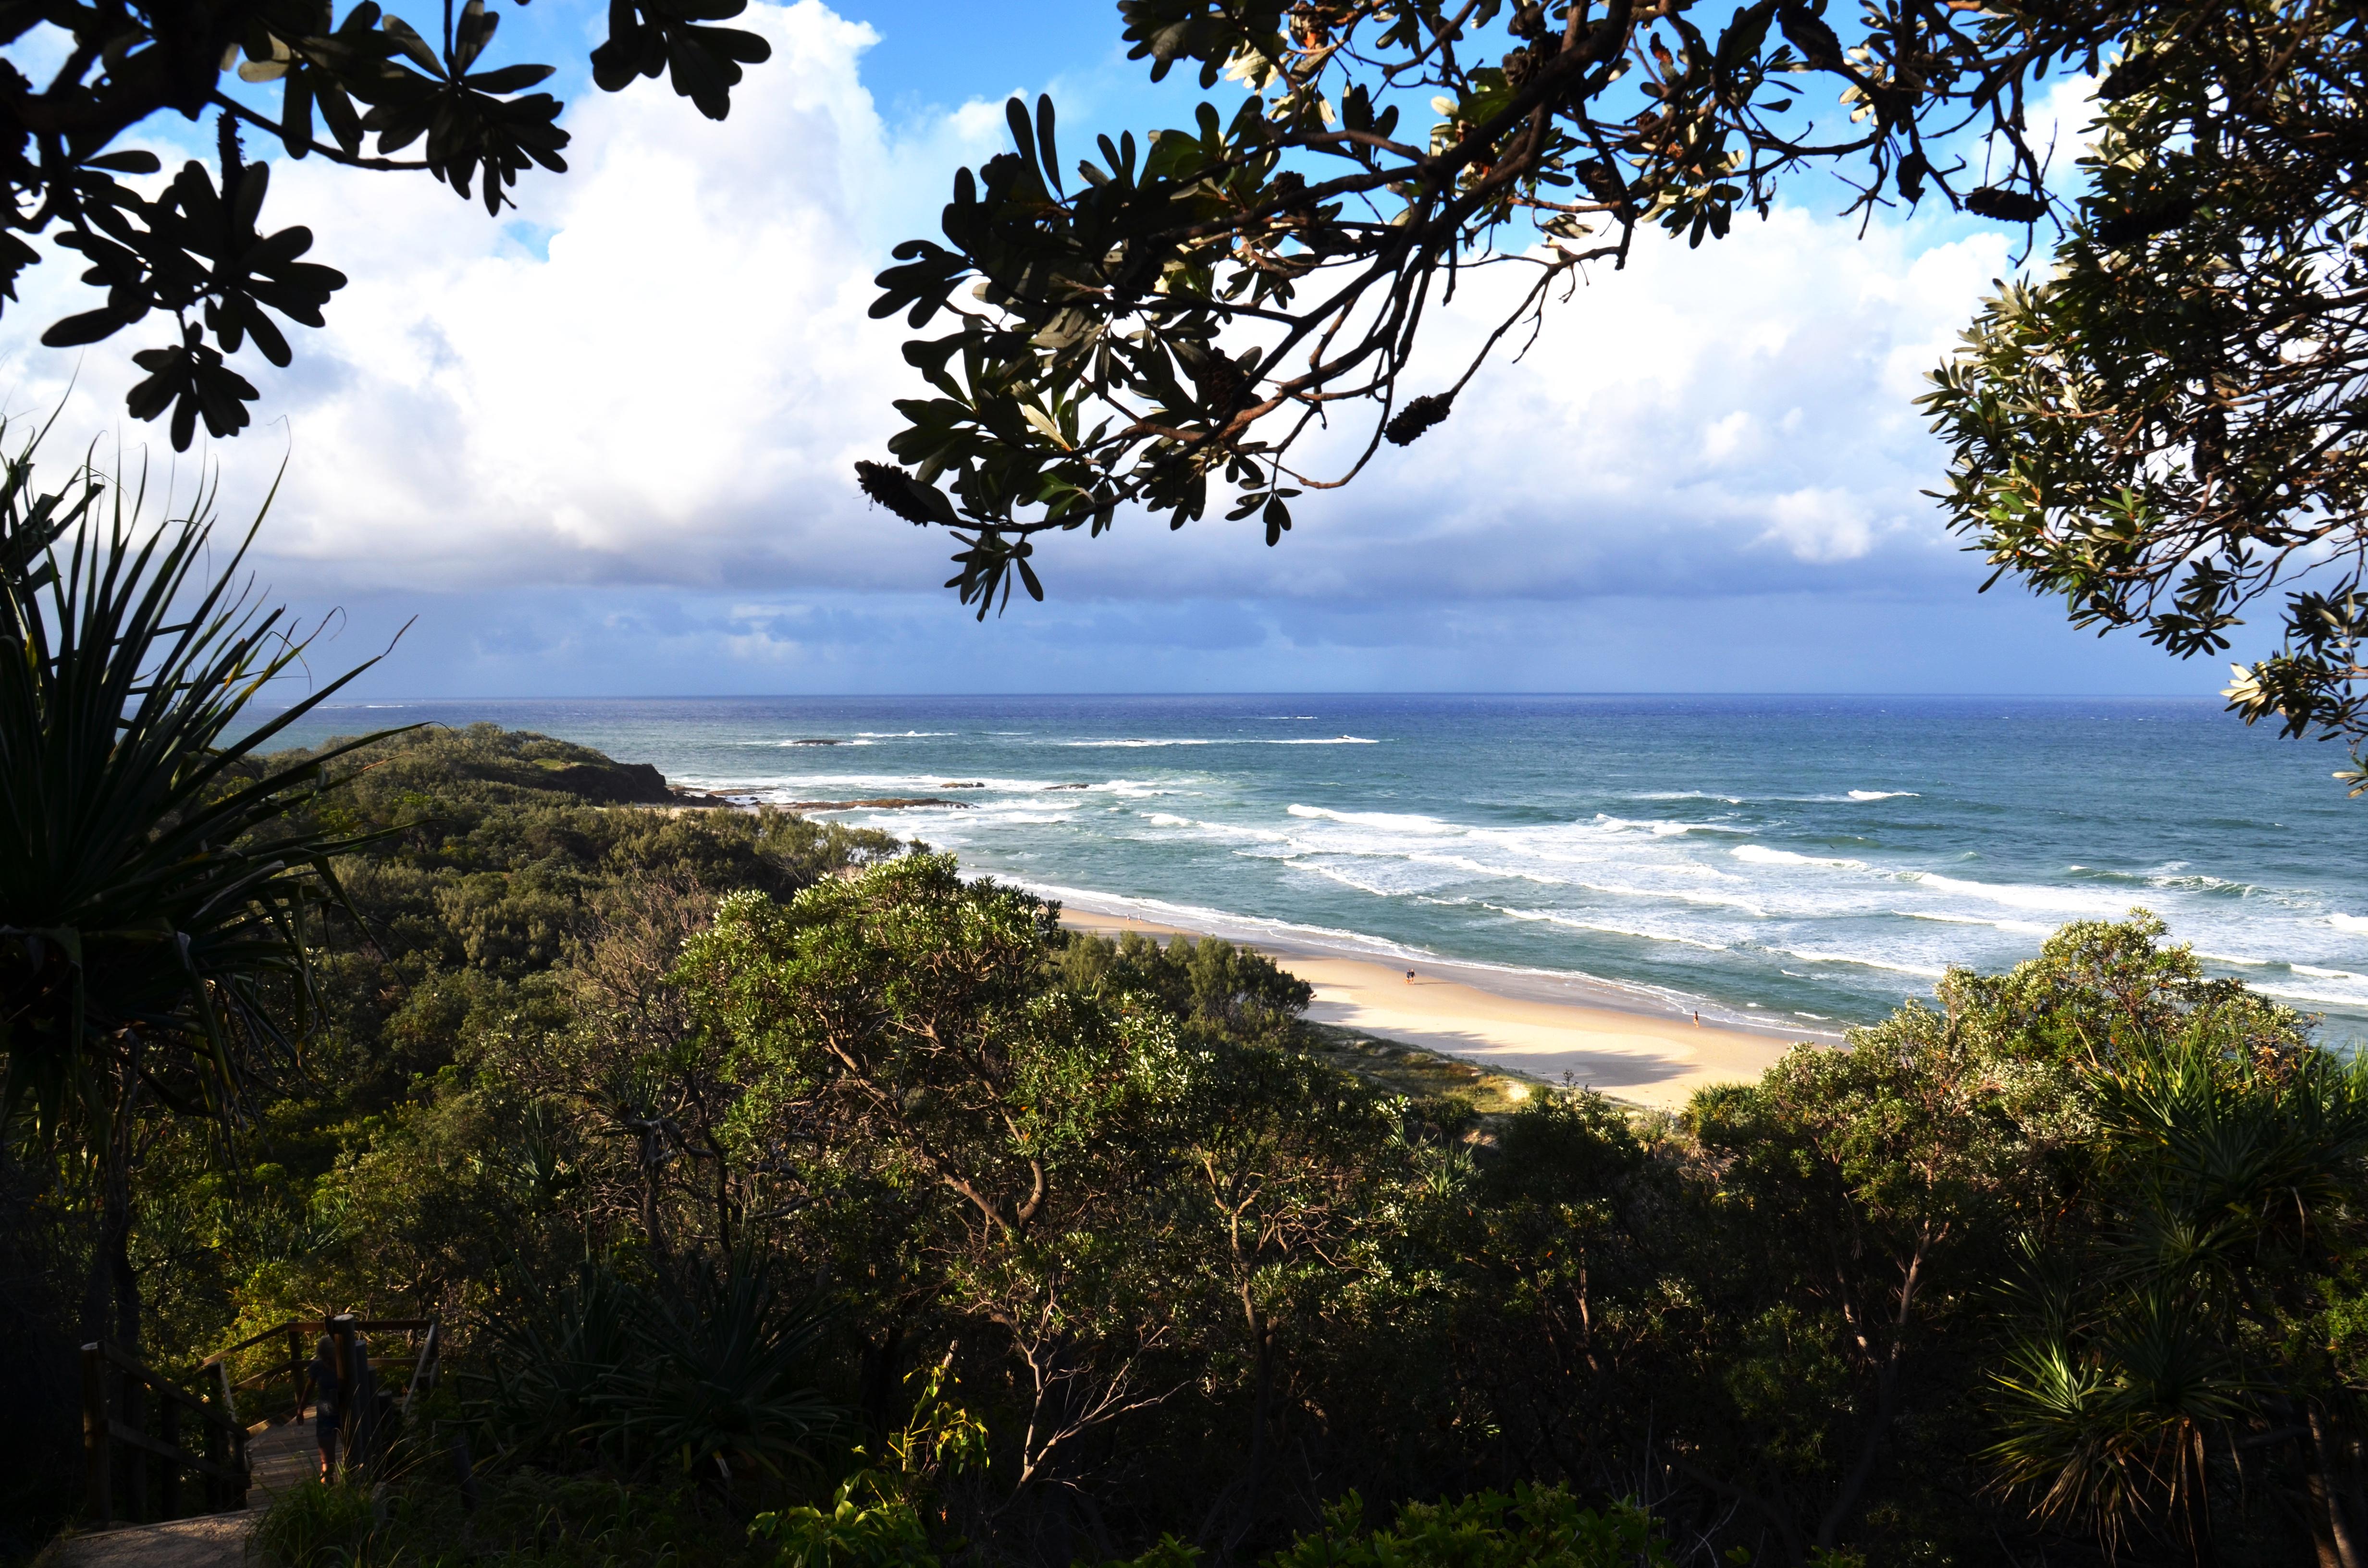 Stock Charts Australia: Free stock photo of australia beach stradbroke island,Chart